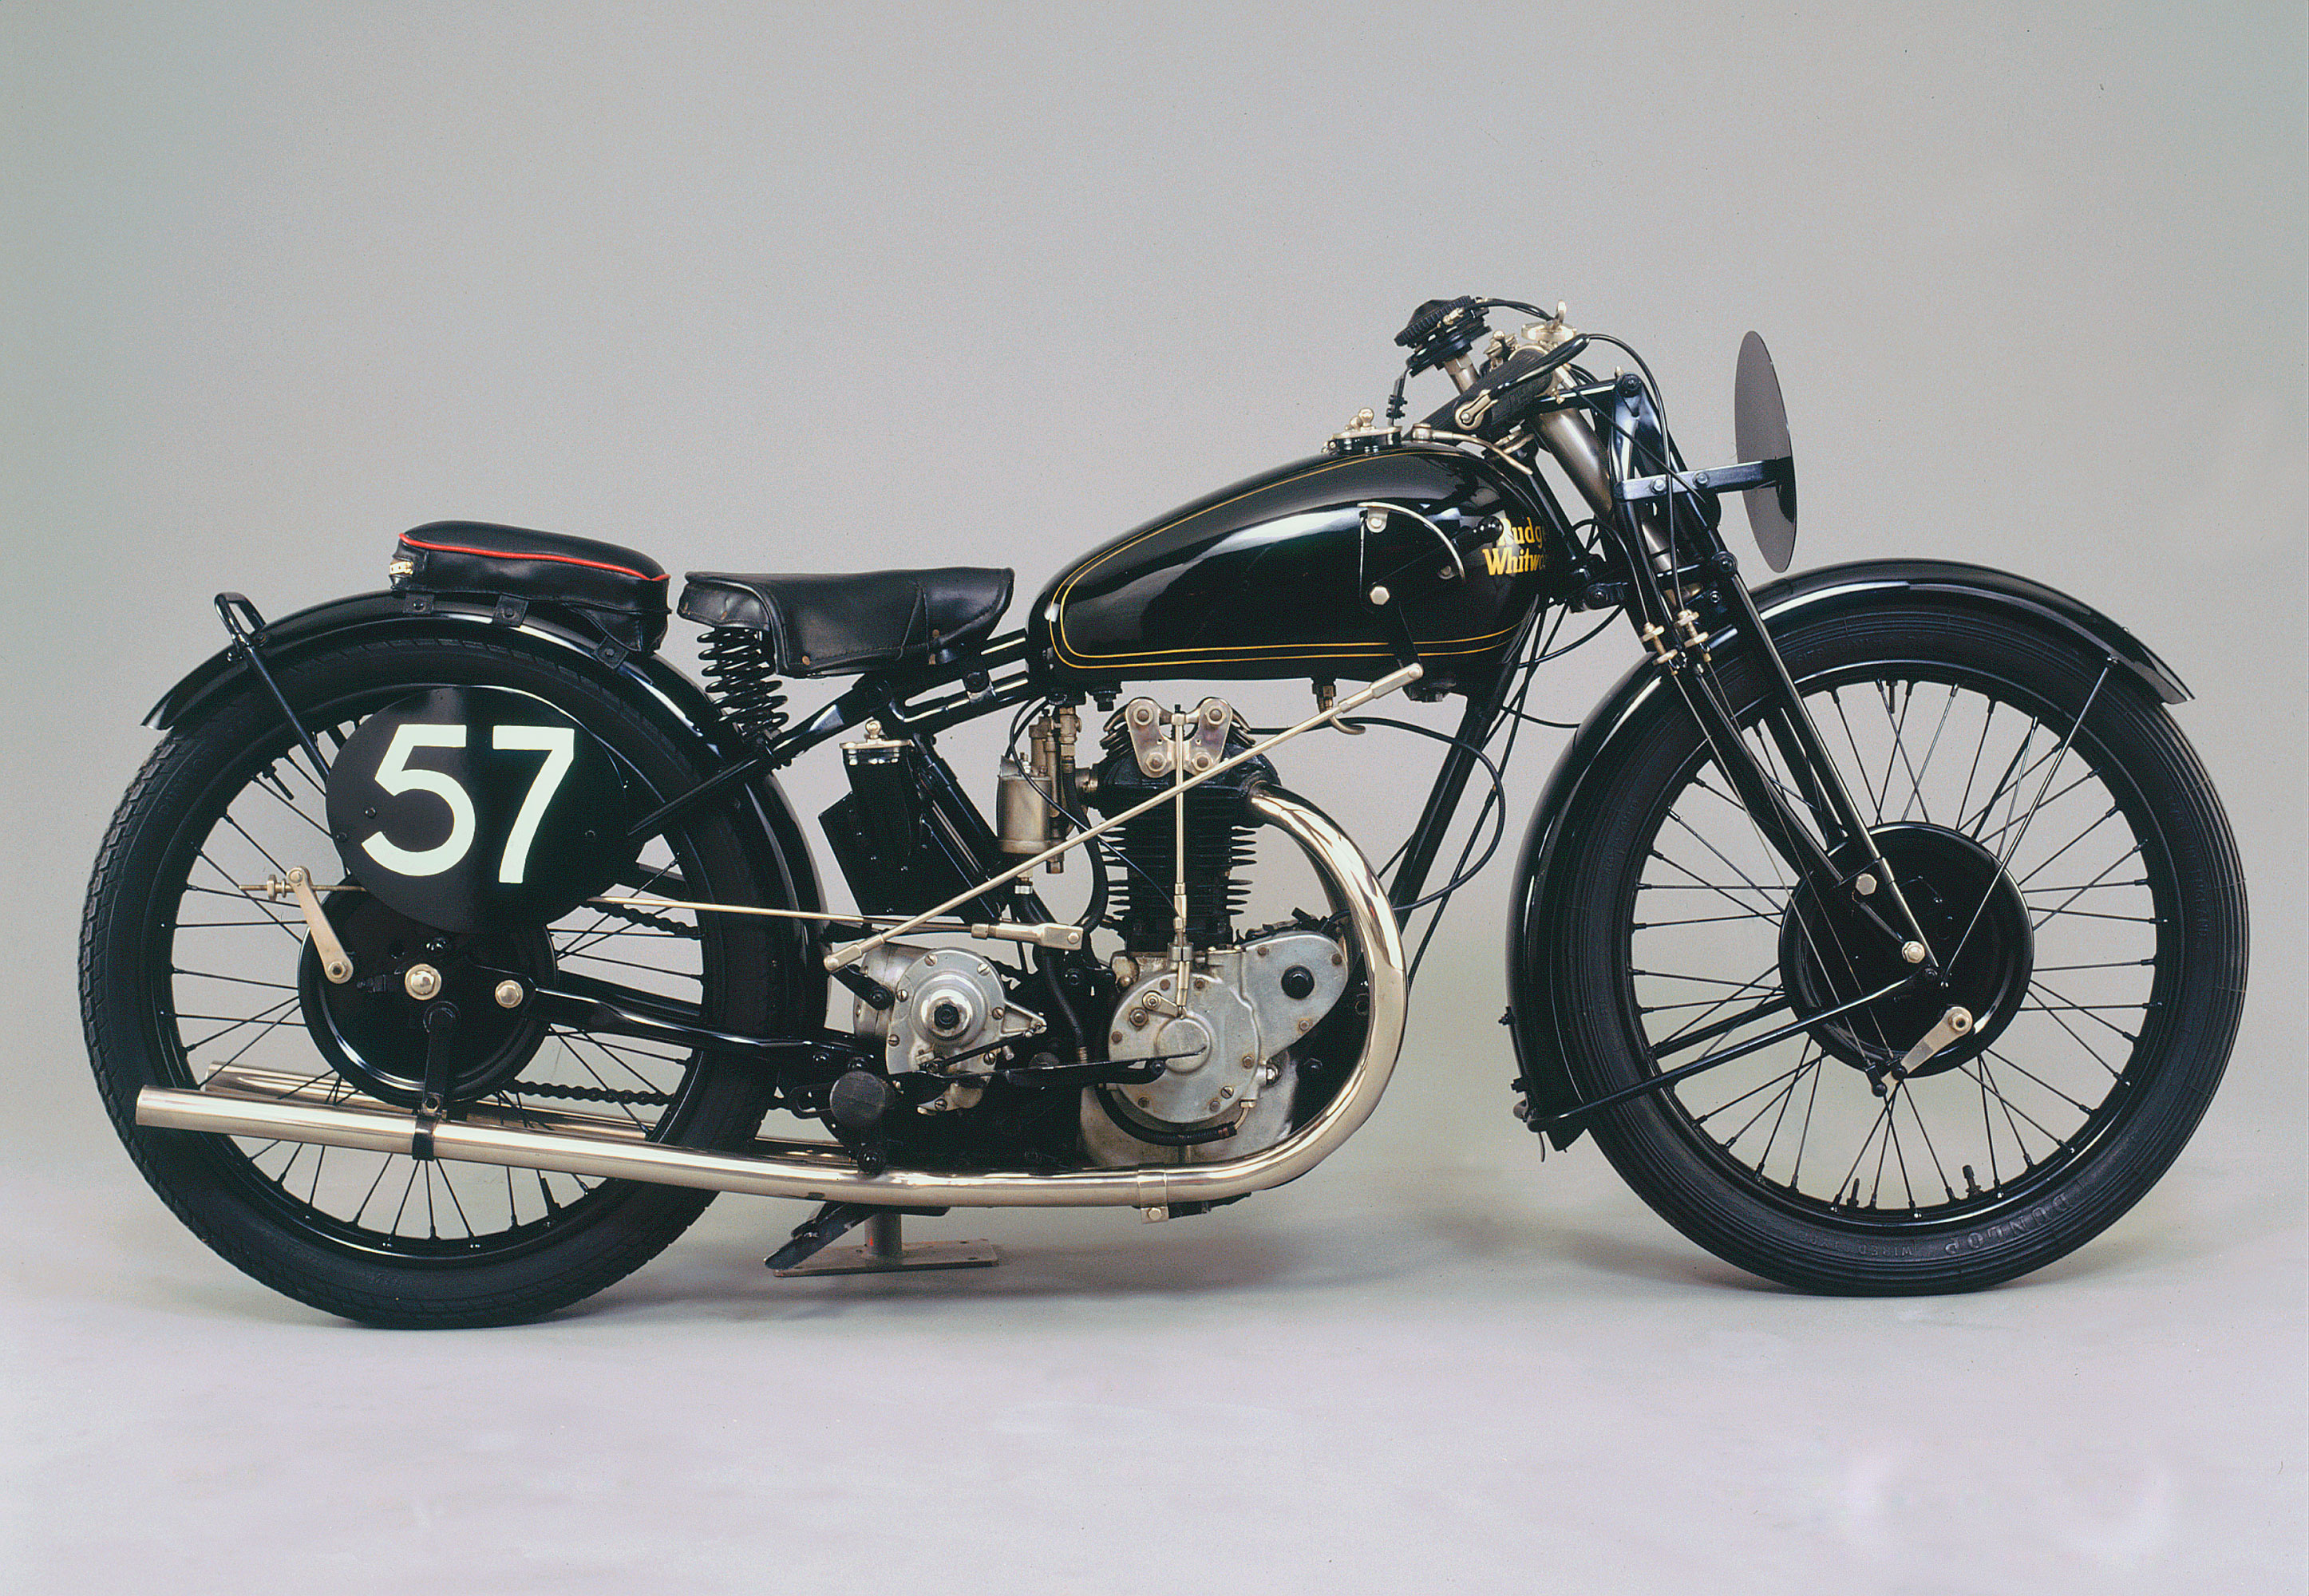 Rudge Whitworth 1928